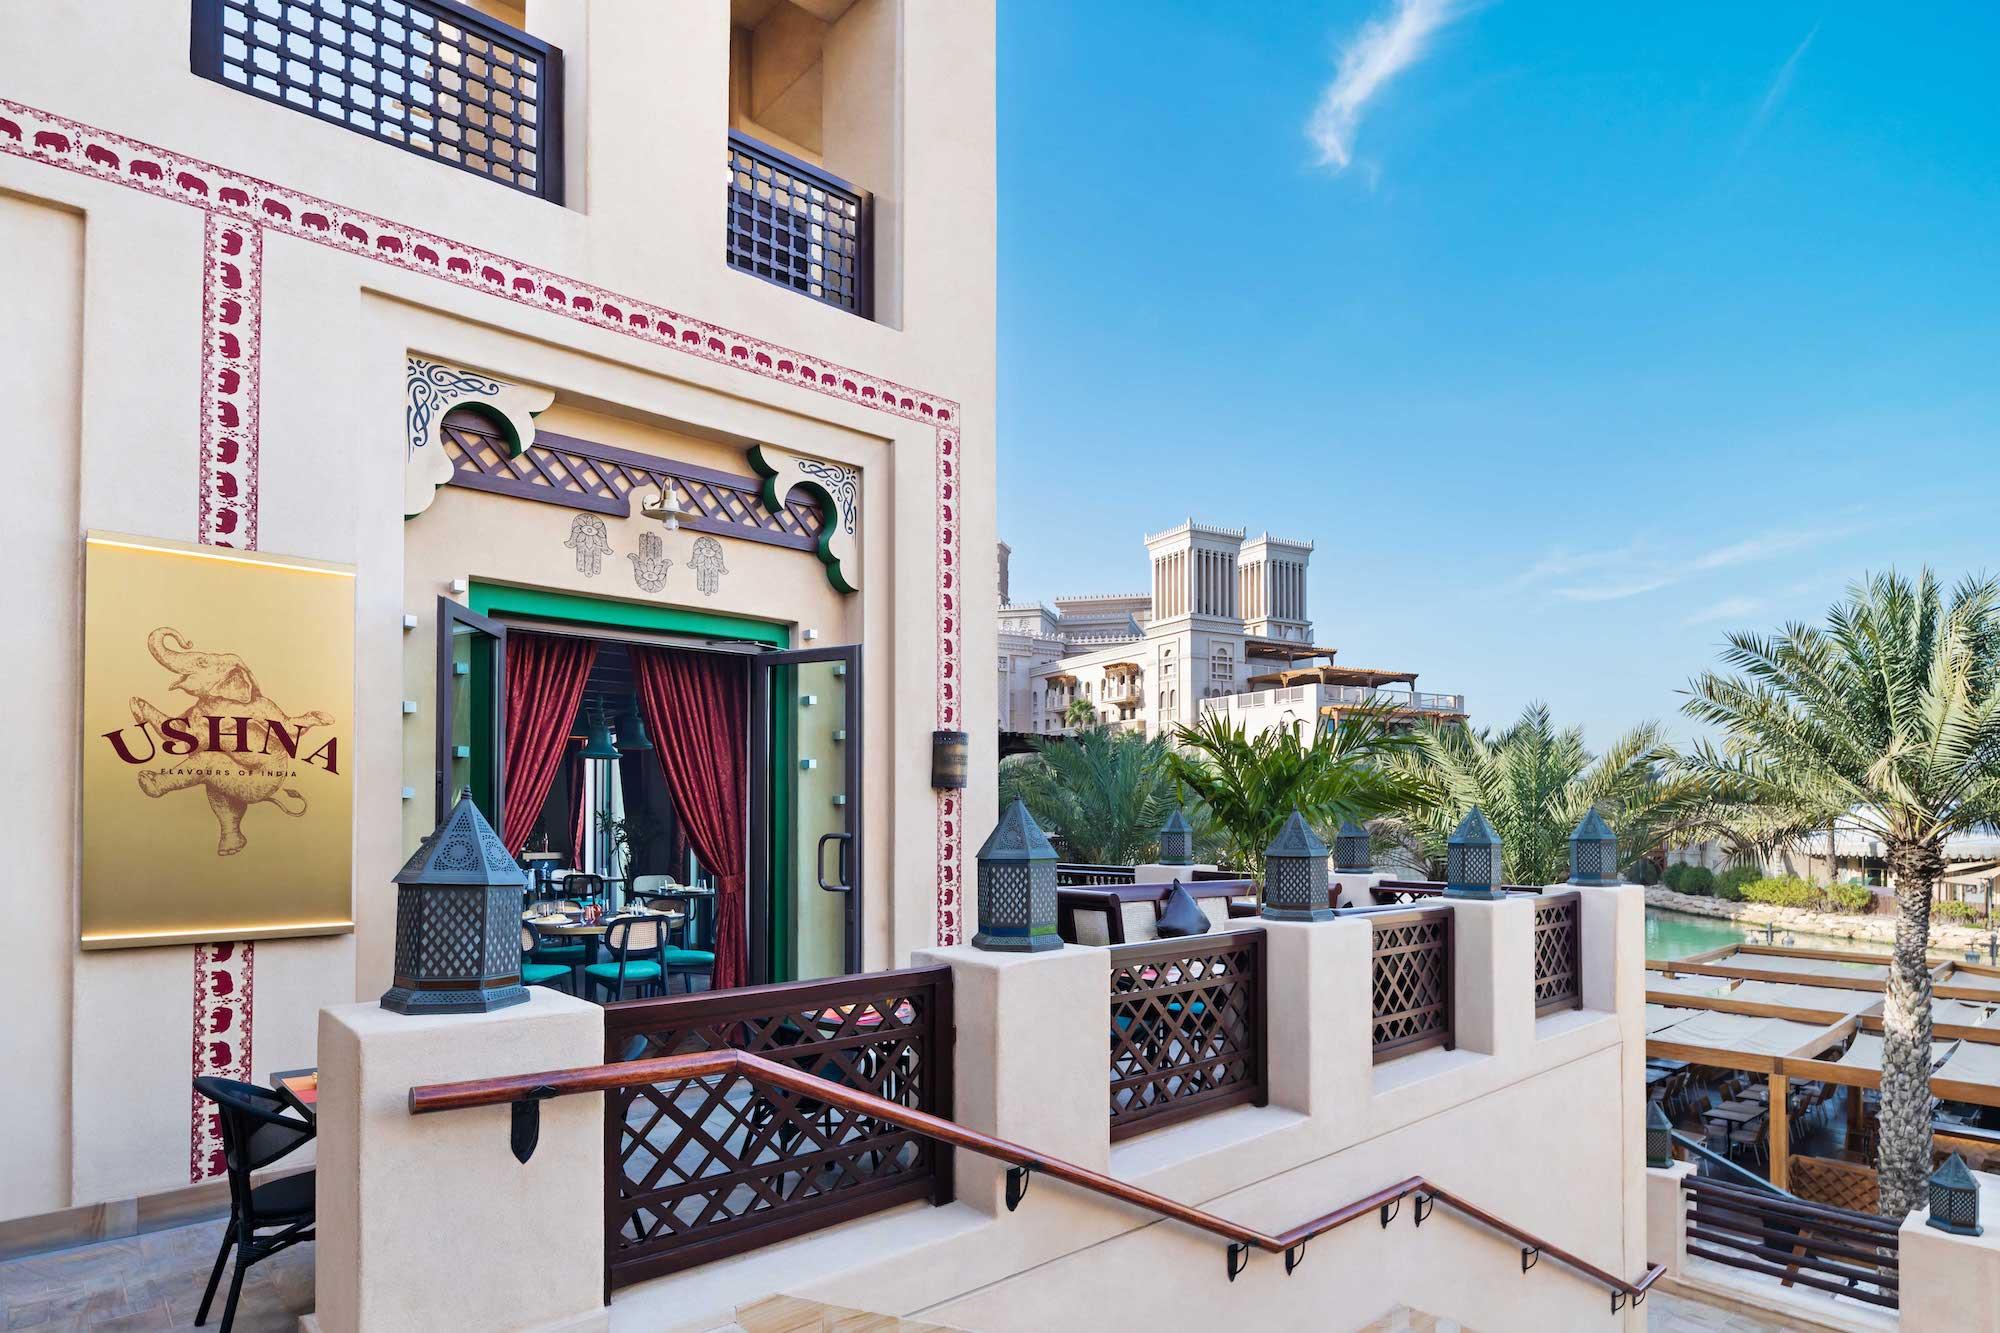 Ushna Madinat-Interior Design Dubai